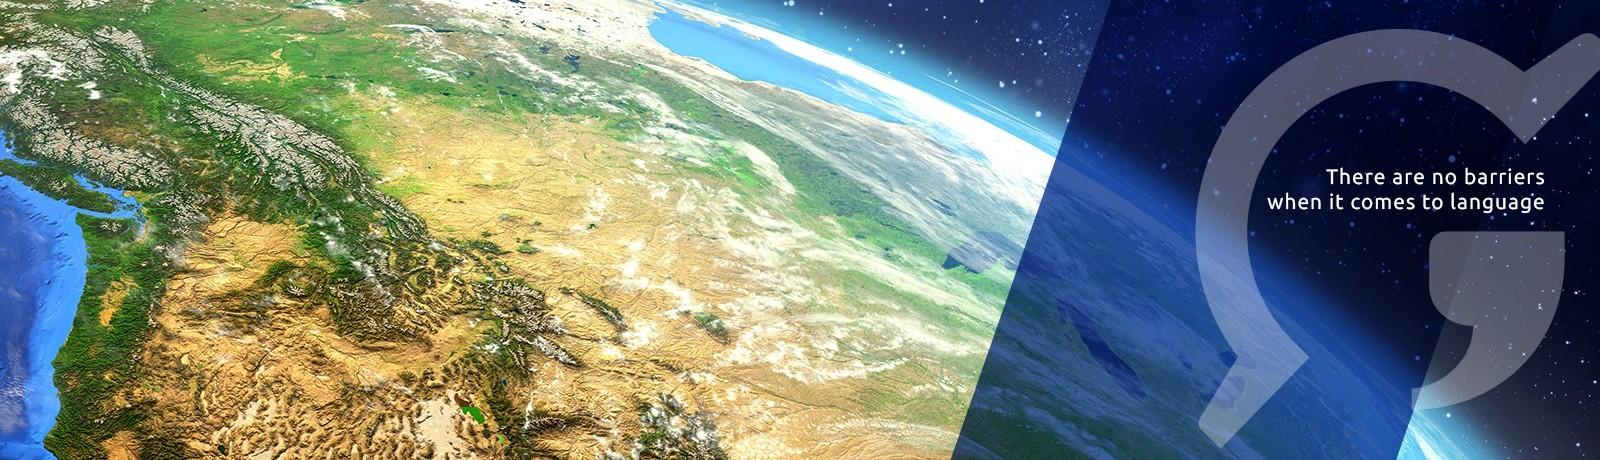 TransGlobe International Header Image